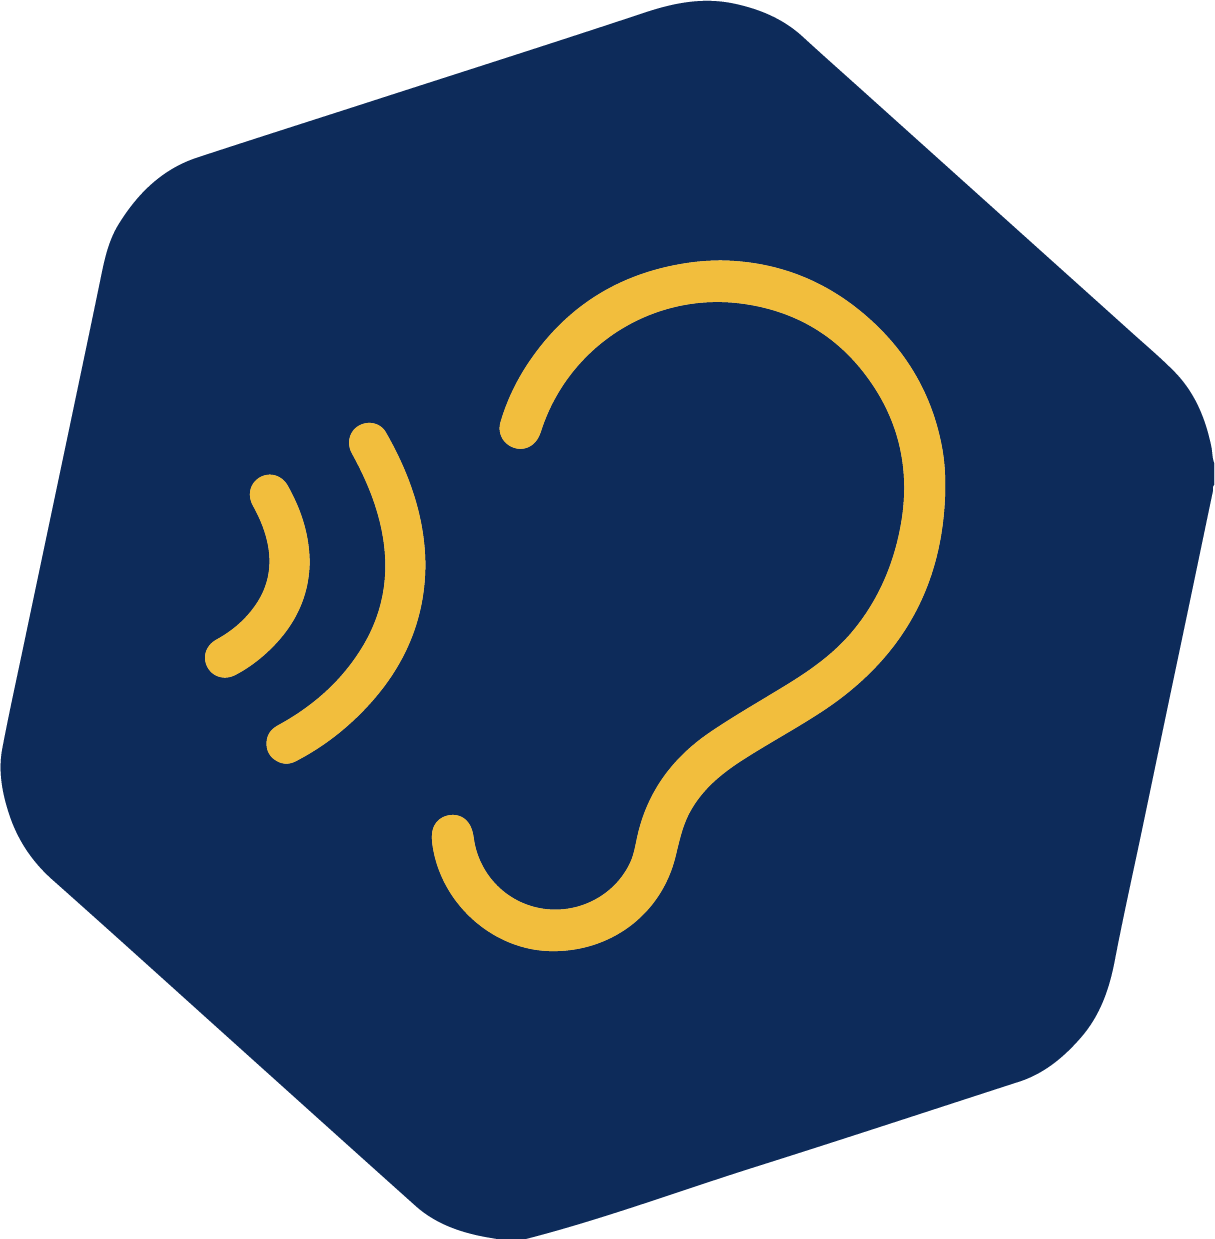 Auditory Impairments